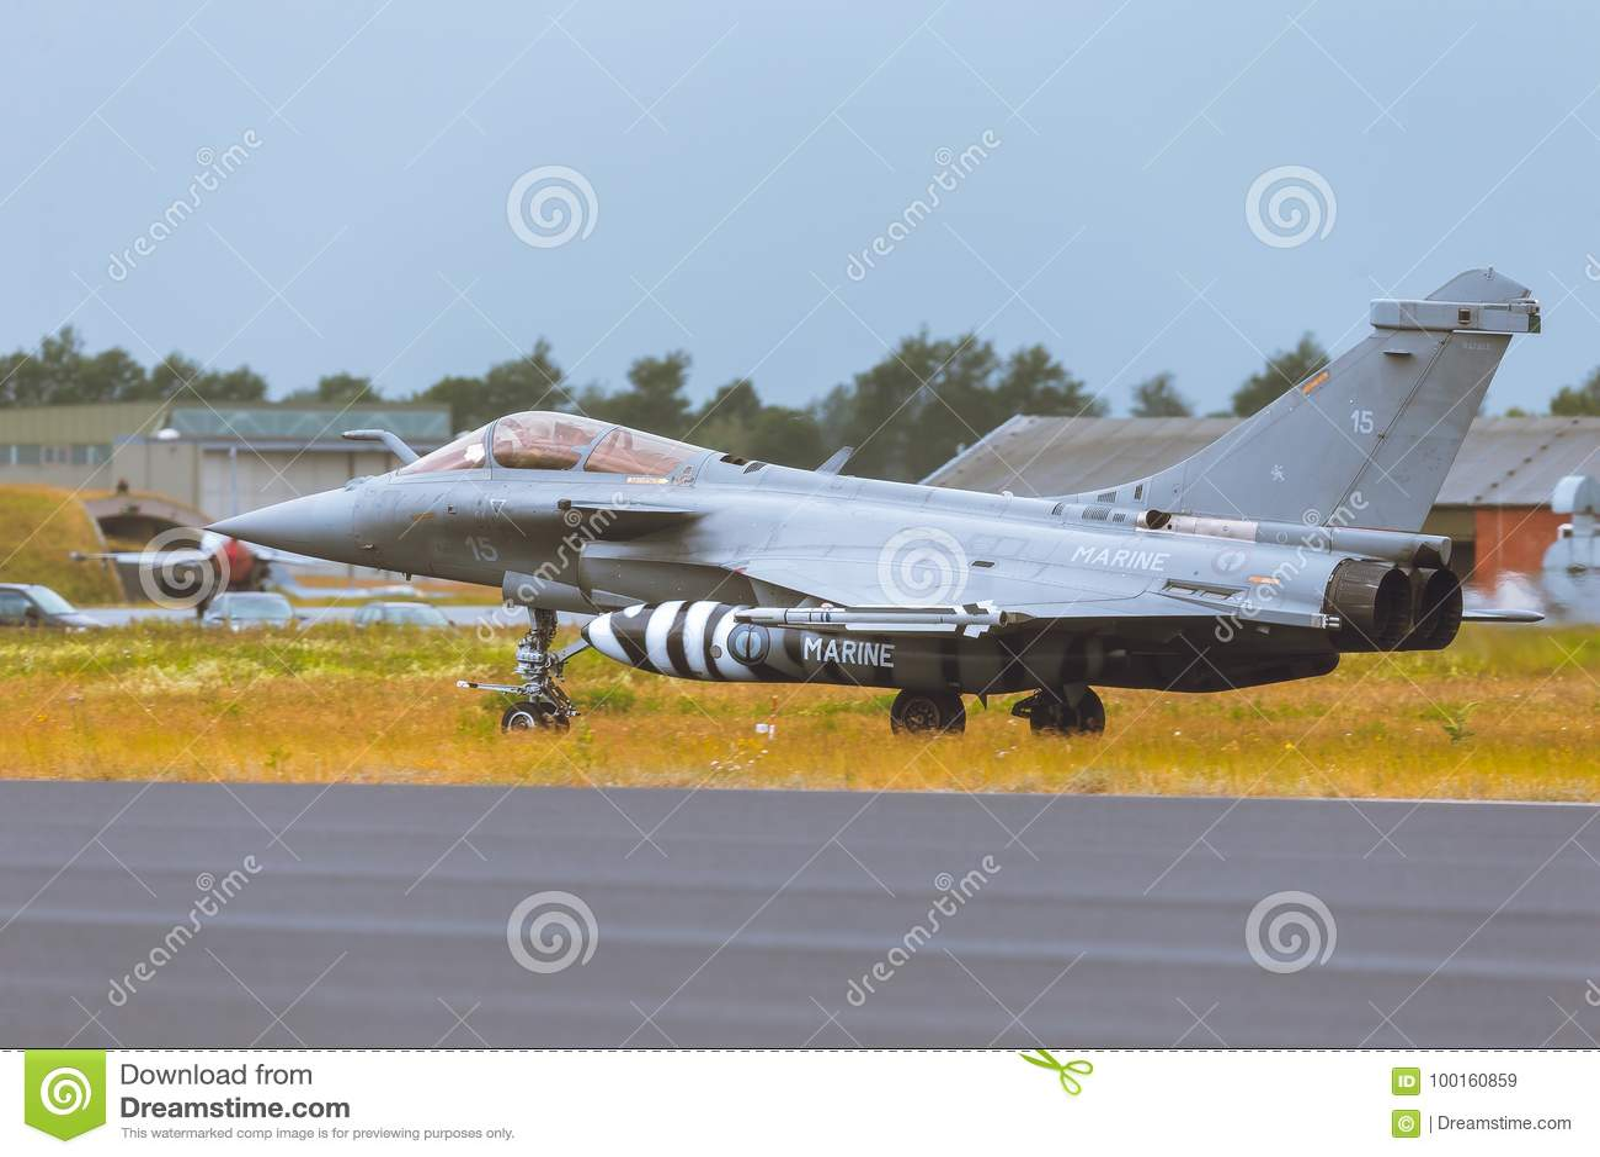 Dassault Rafale At NATO Tiger Meet 2014 Editorial Stock